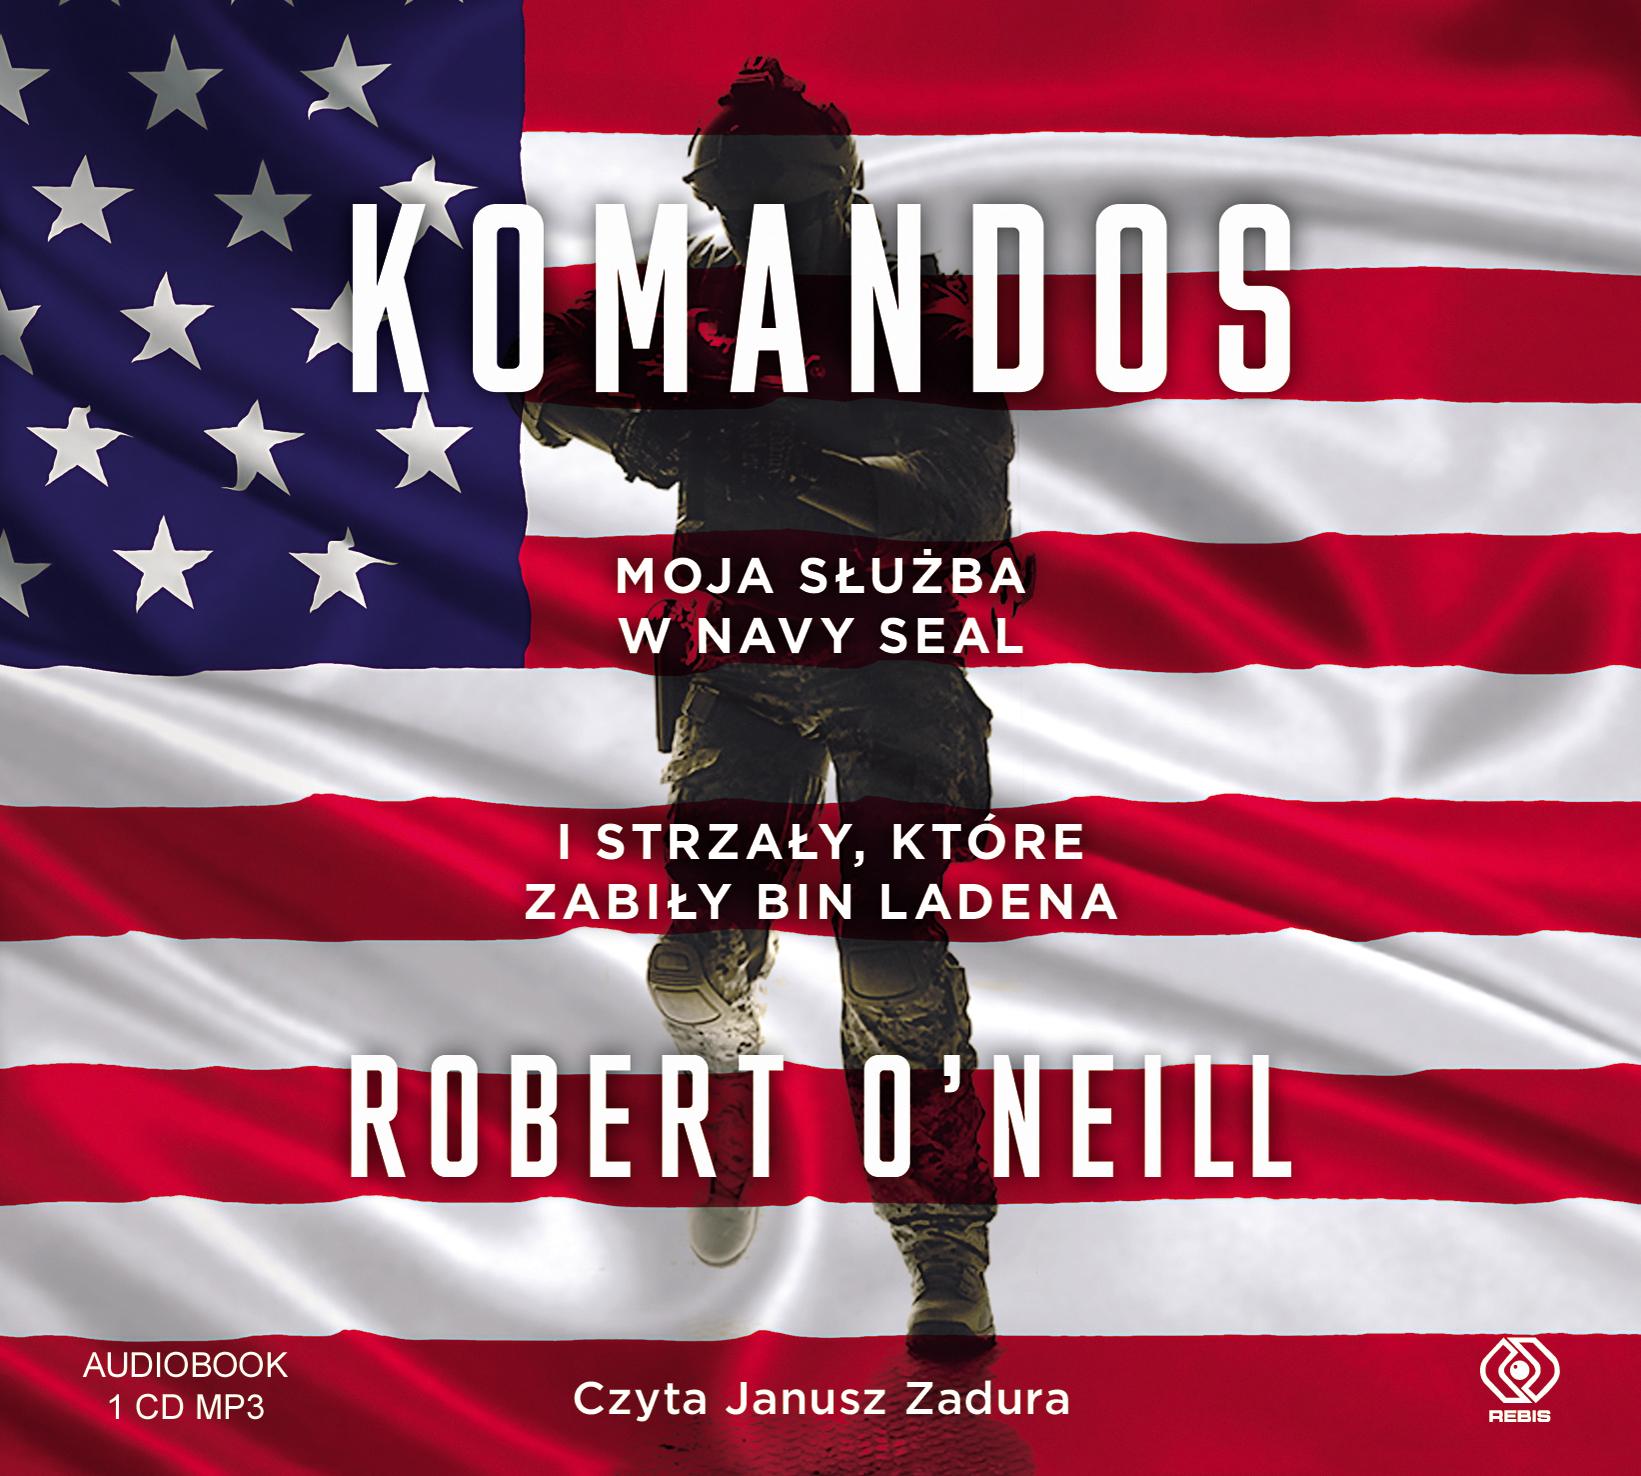 O'NEILL ROBERT – KOMANDOS